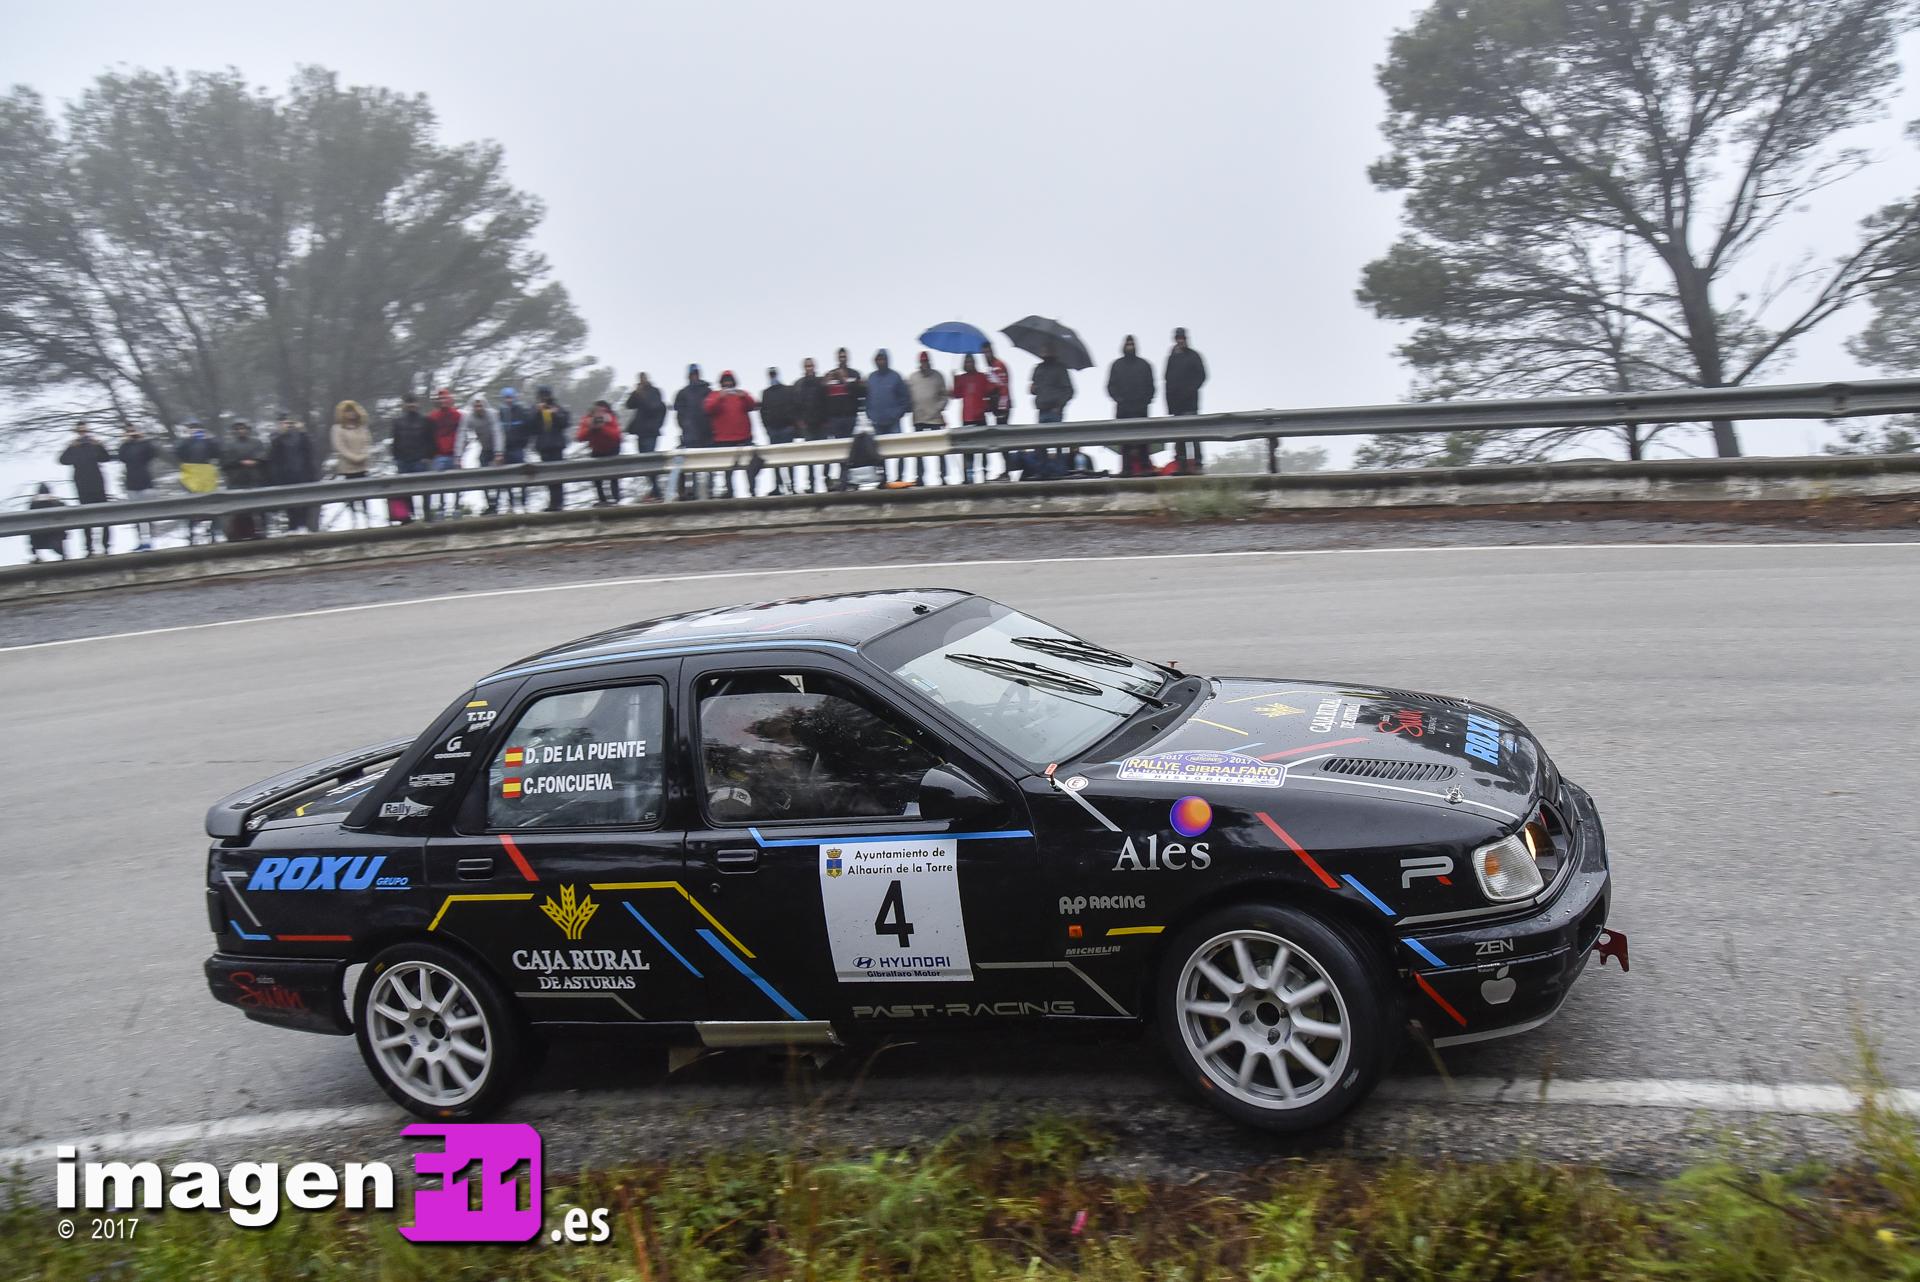 Cele Foncueva, Past Racing, Ford Sierra Cosworth, Rallye Gibralfaro